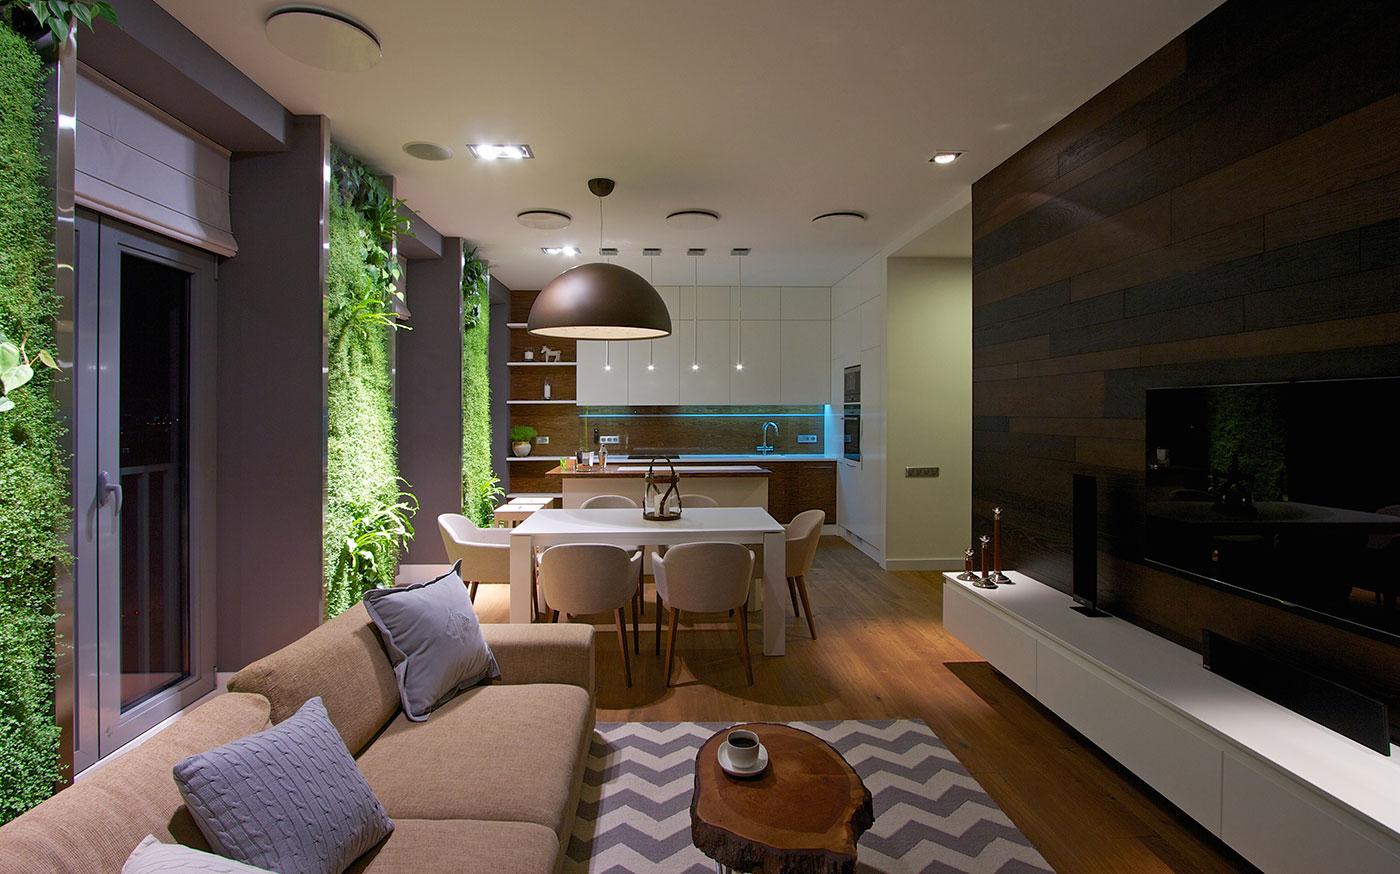 Modern Apartment Design Green Walls By Svoya - Modern-apartment-design